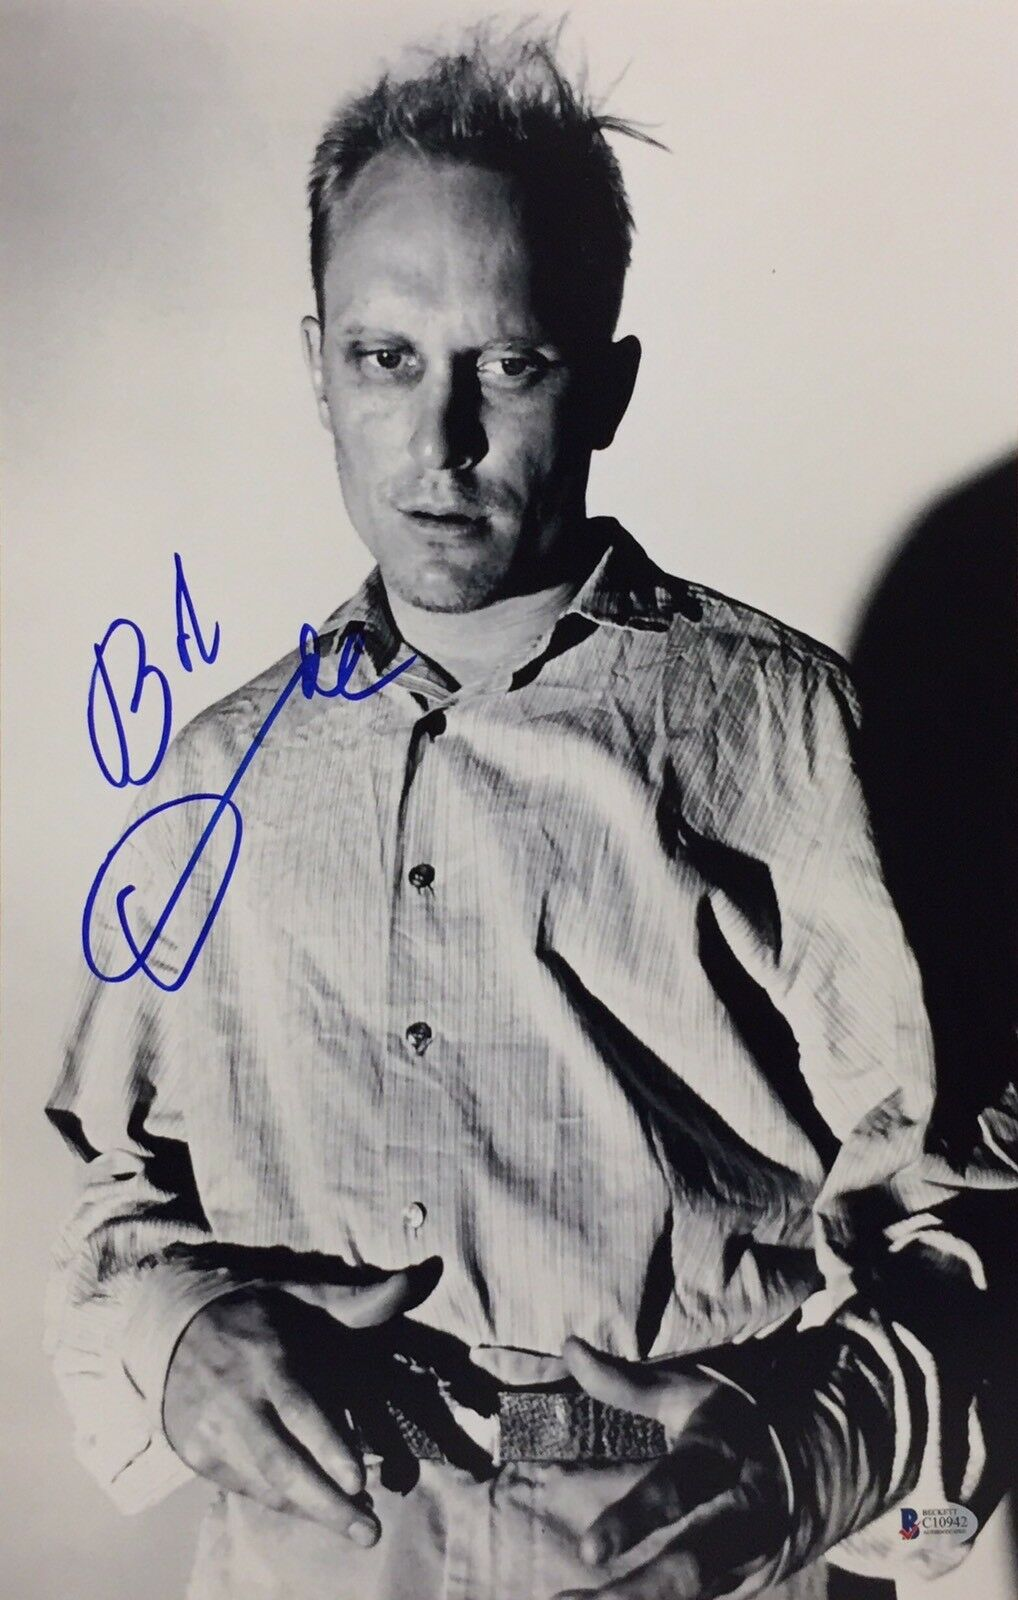 Robert Duvall Signed 11x17 Photo Beckett C10942